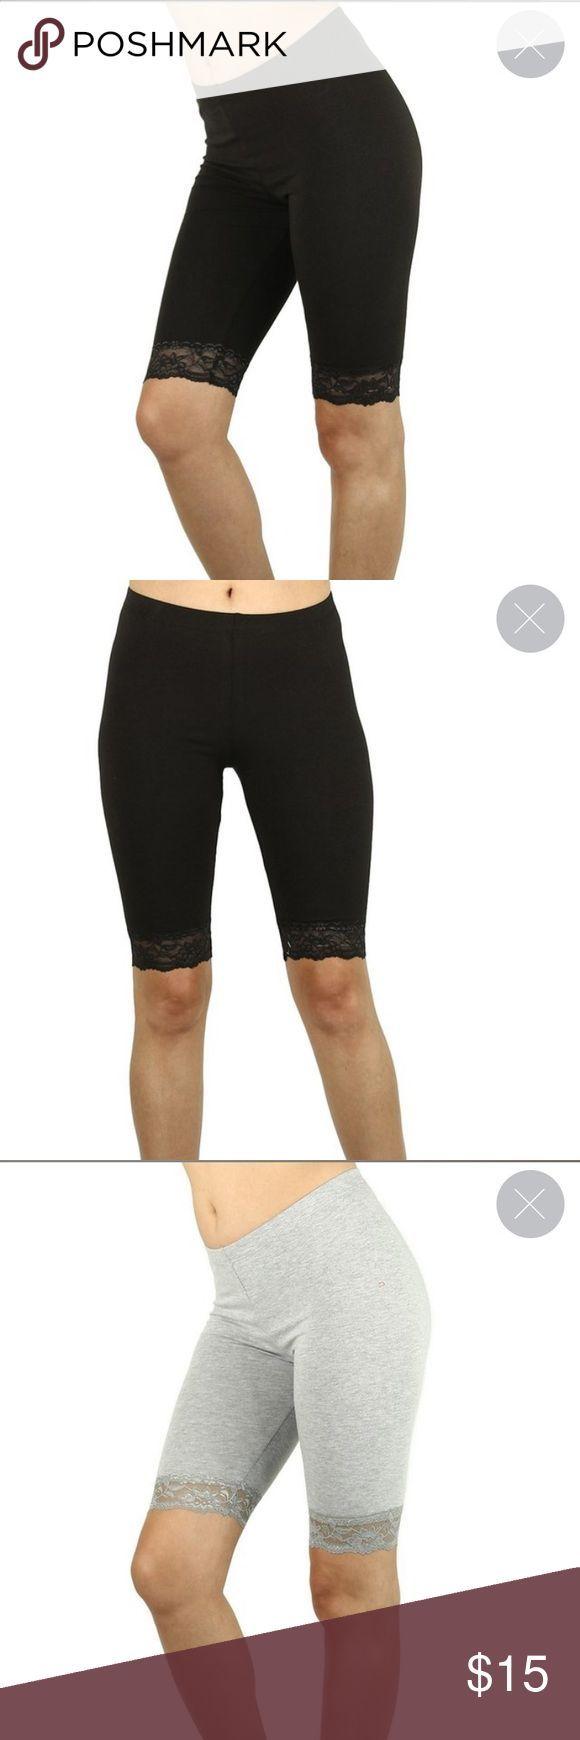 Lace biker shorts Made in the USA Medium Rise Comfort Waist Tight Fit Ultra Comf…   – Biker Shorts